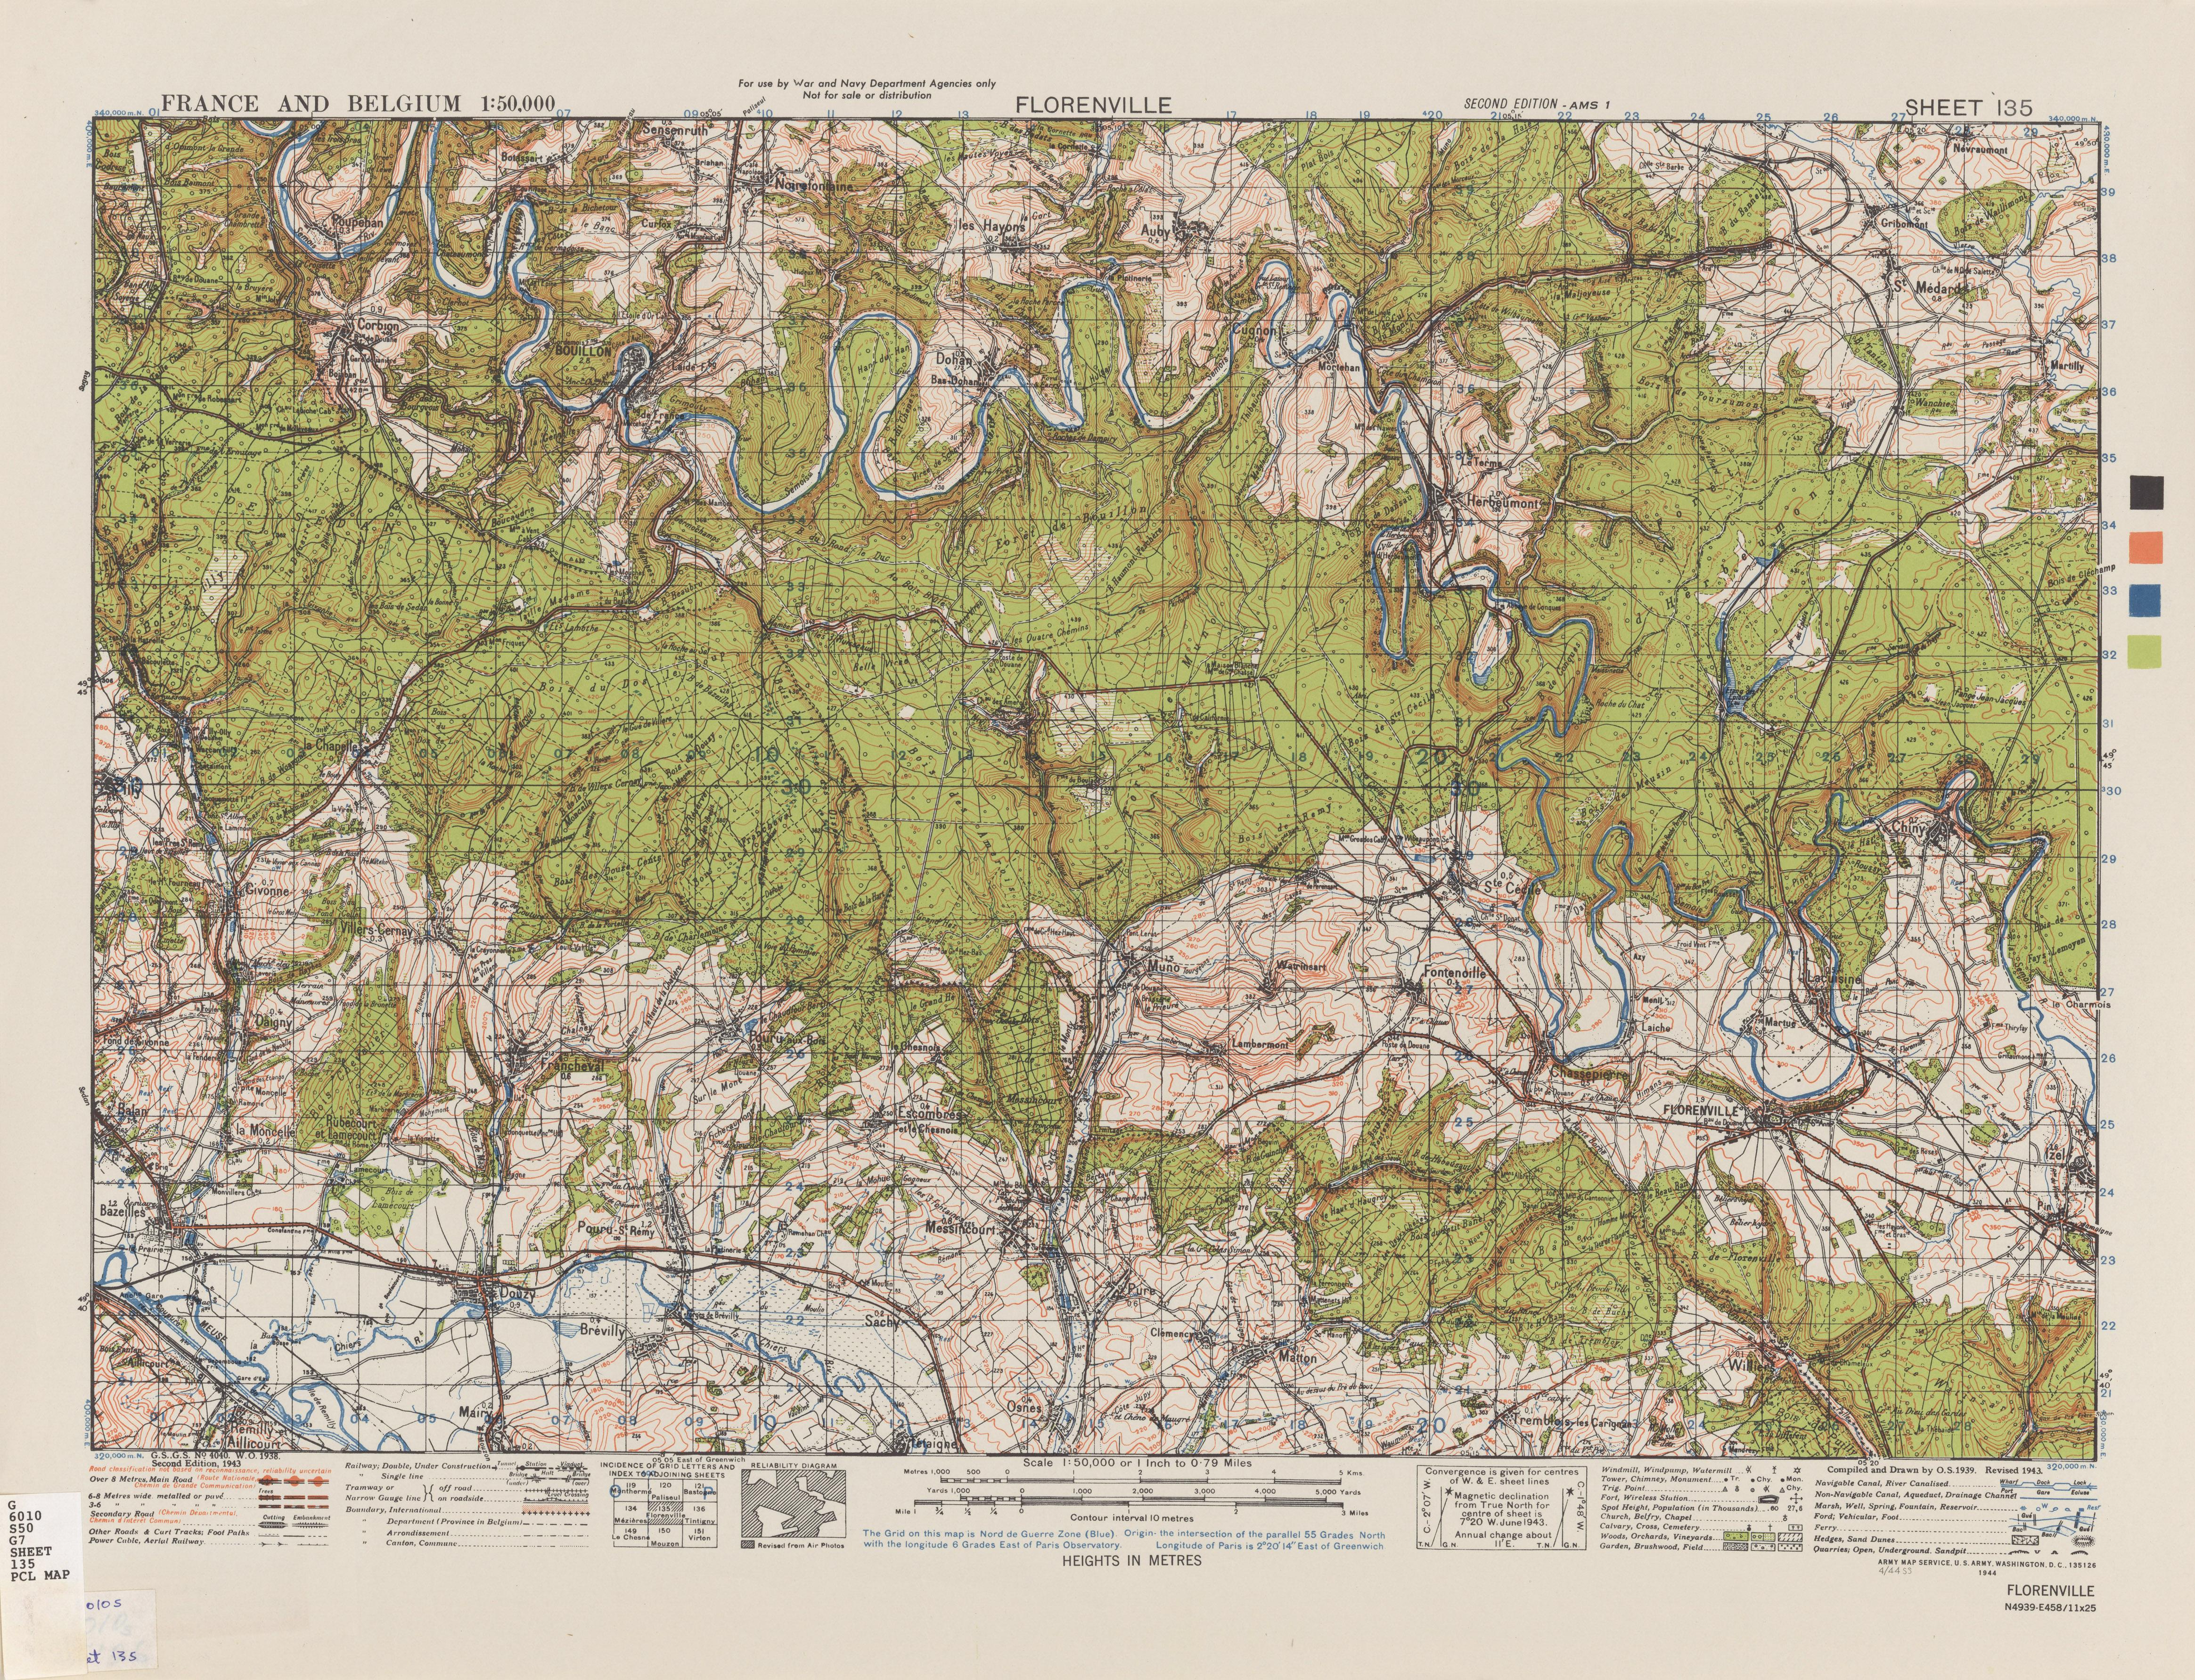 Belgium AMS Topographic Maps PerryCasta eda Map Collection UT – Belgium Topographic Map